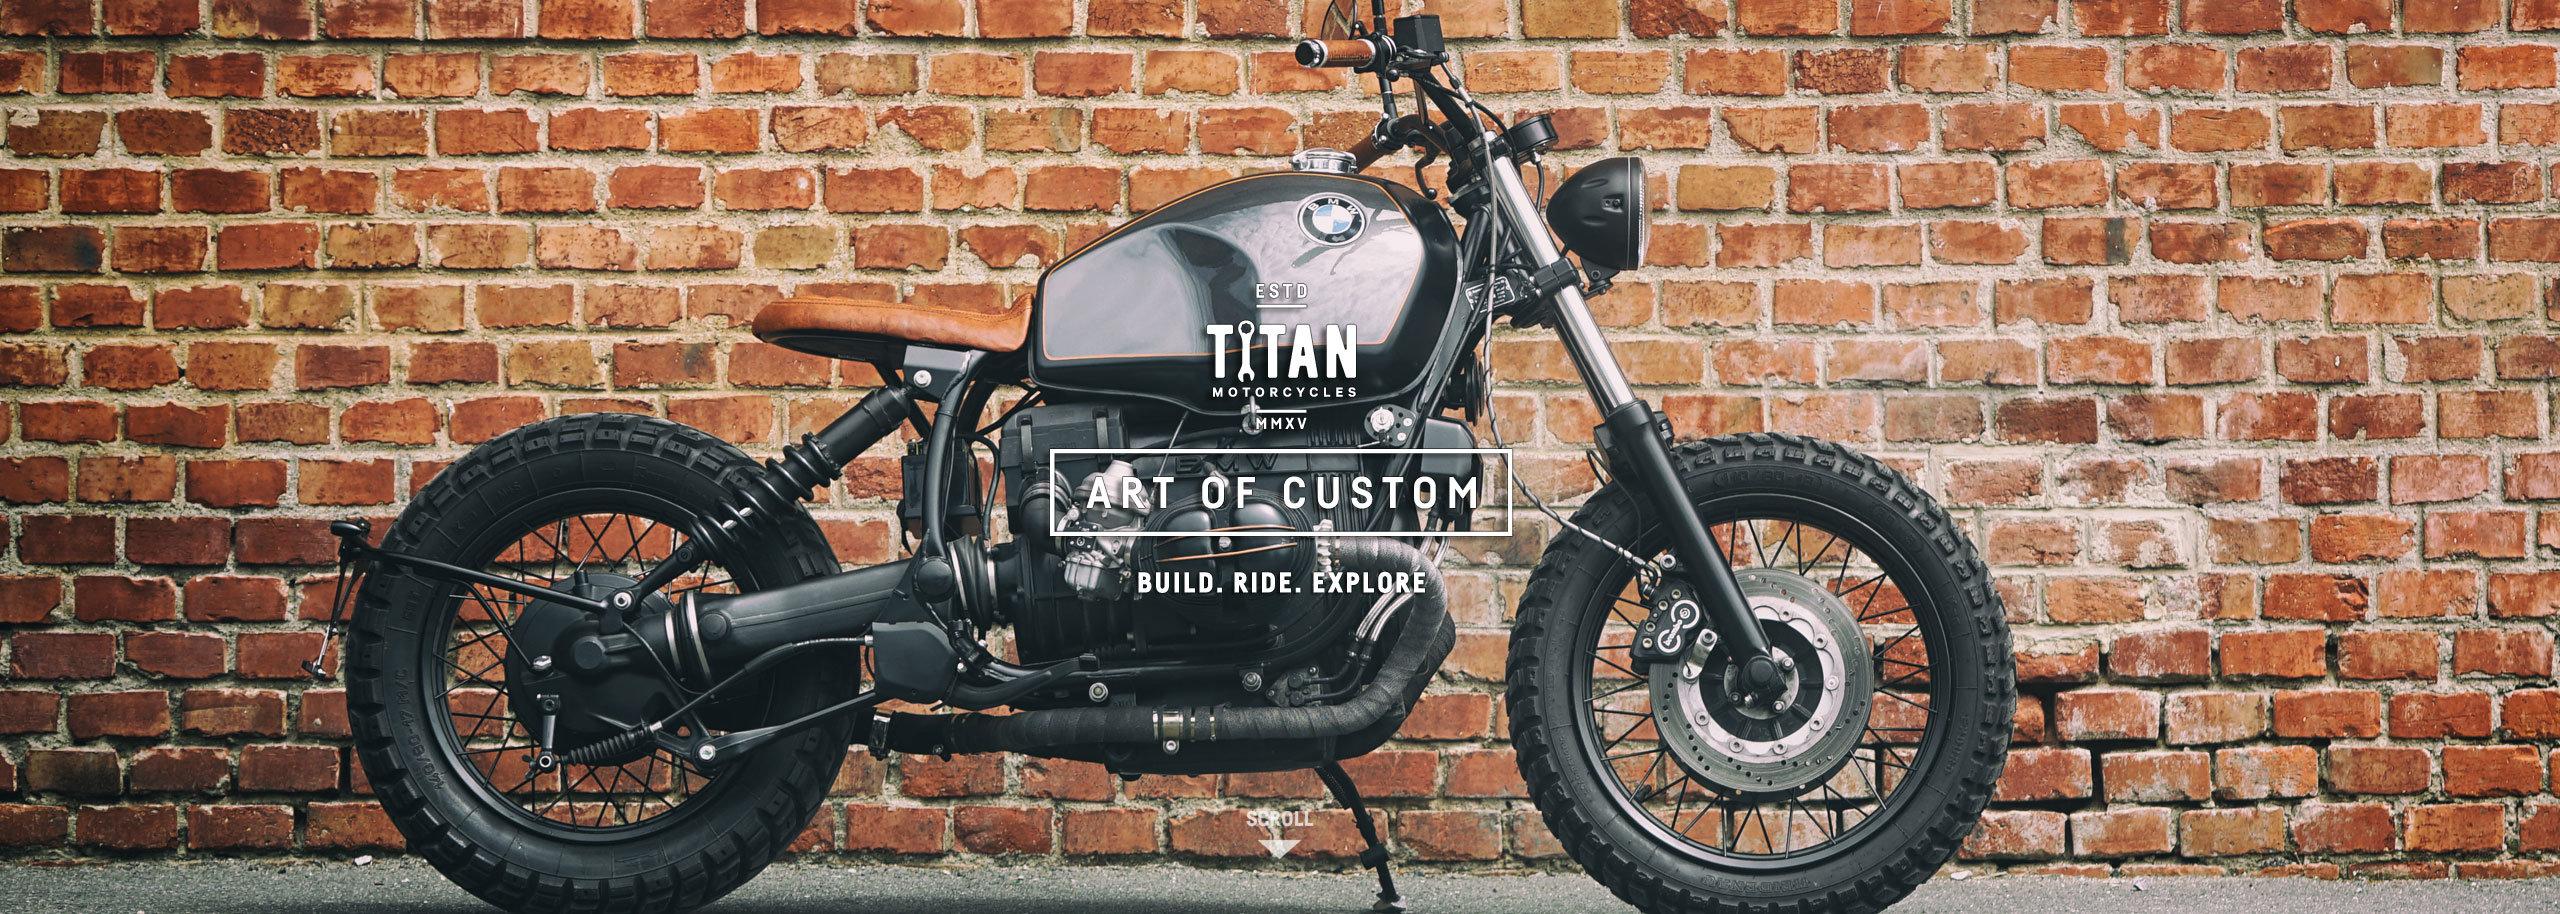 TITAN-Willmann-BMW-Motorrad-Umbau-R100-Cafe-Racer-Graz-Styrian-Custom-Bikes-Sattel-Heck-Umbau